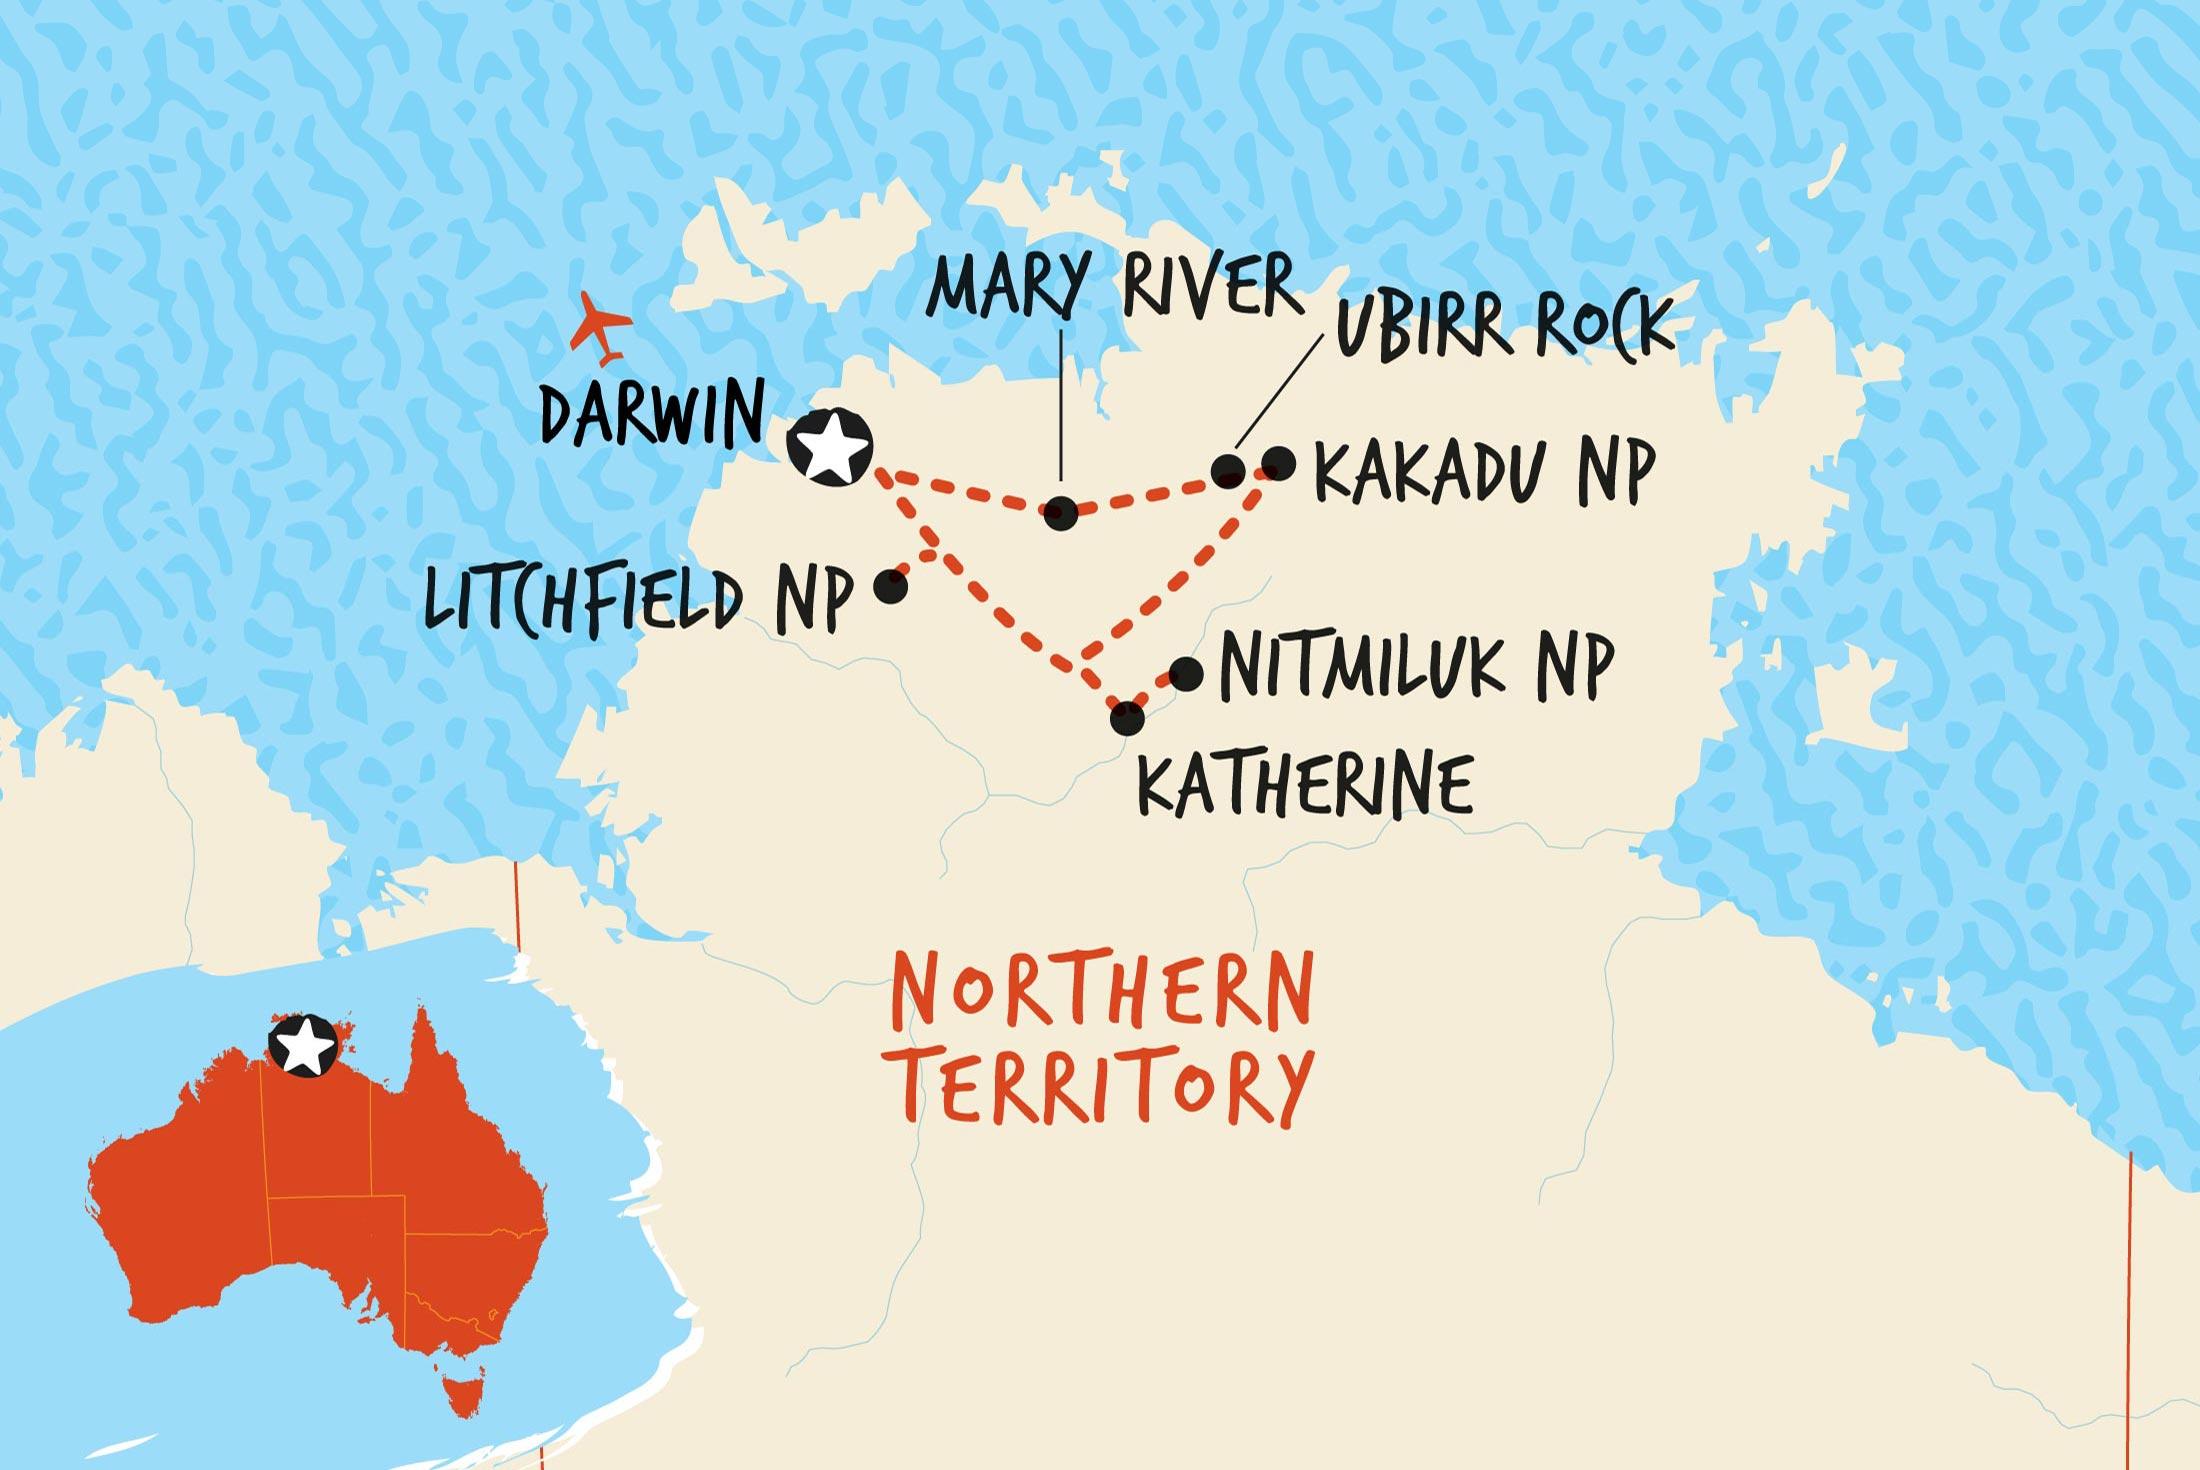 Map of Kakadu, Katherine & Litchfield Adventure including Australia